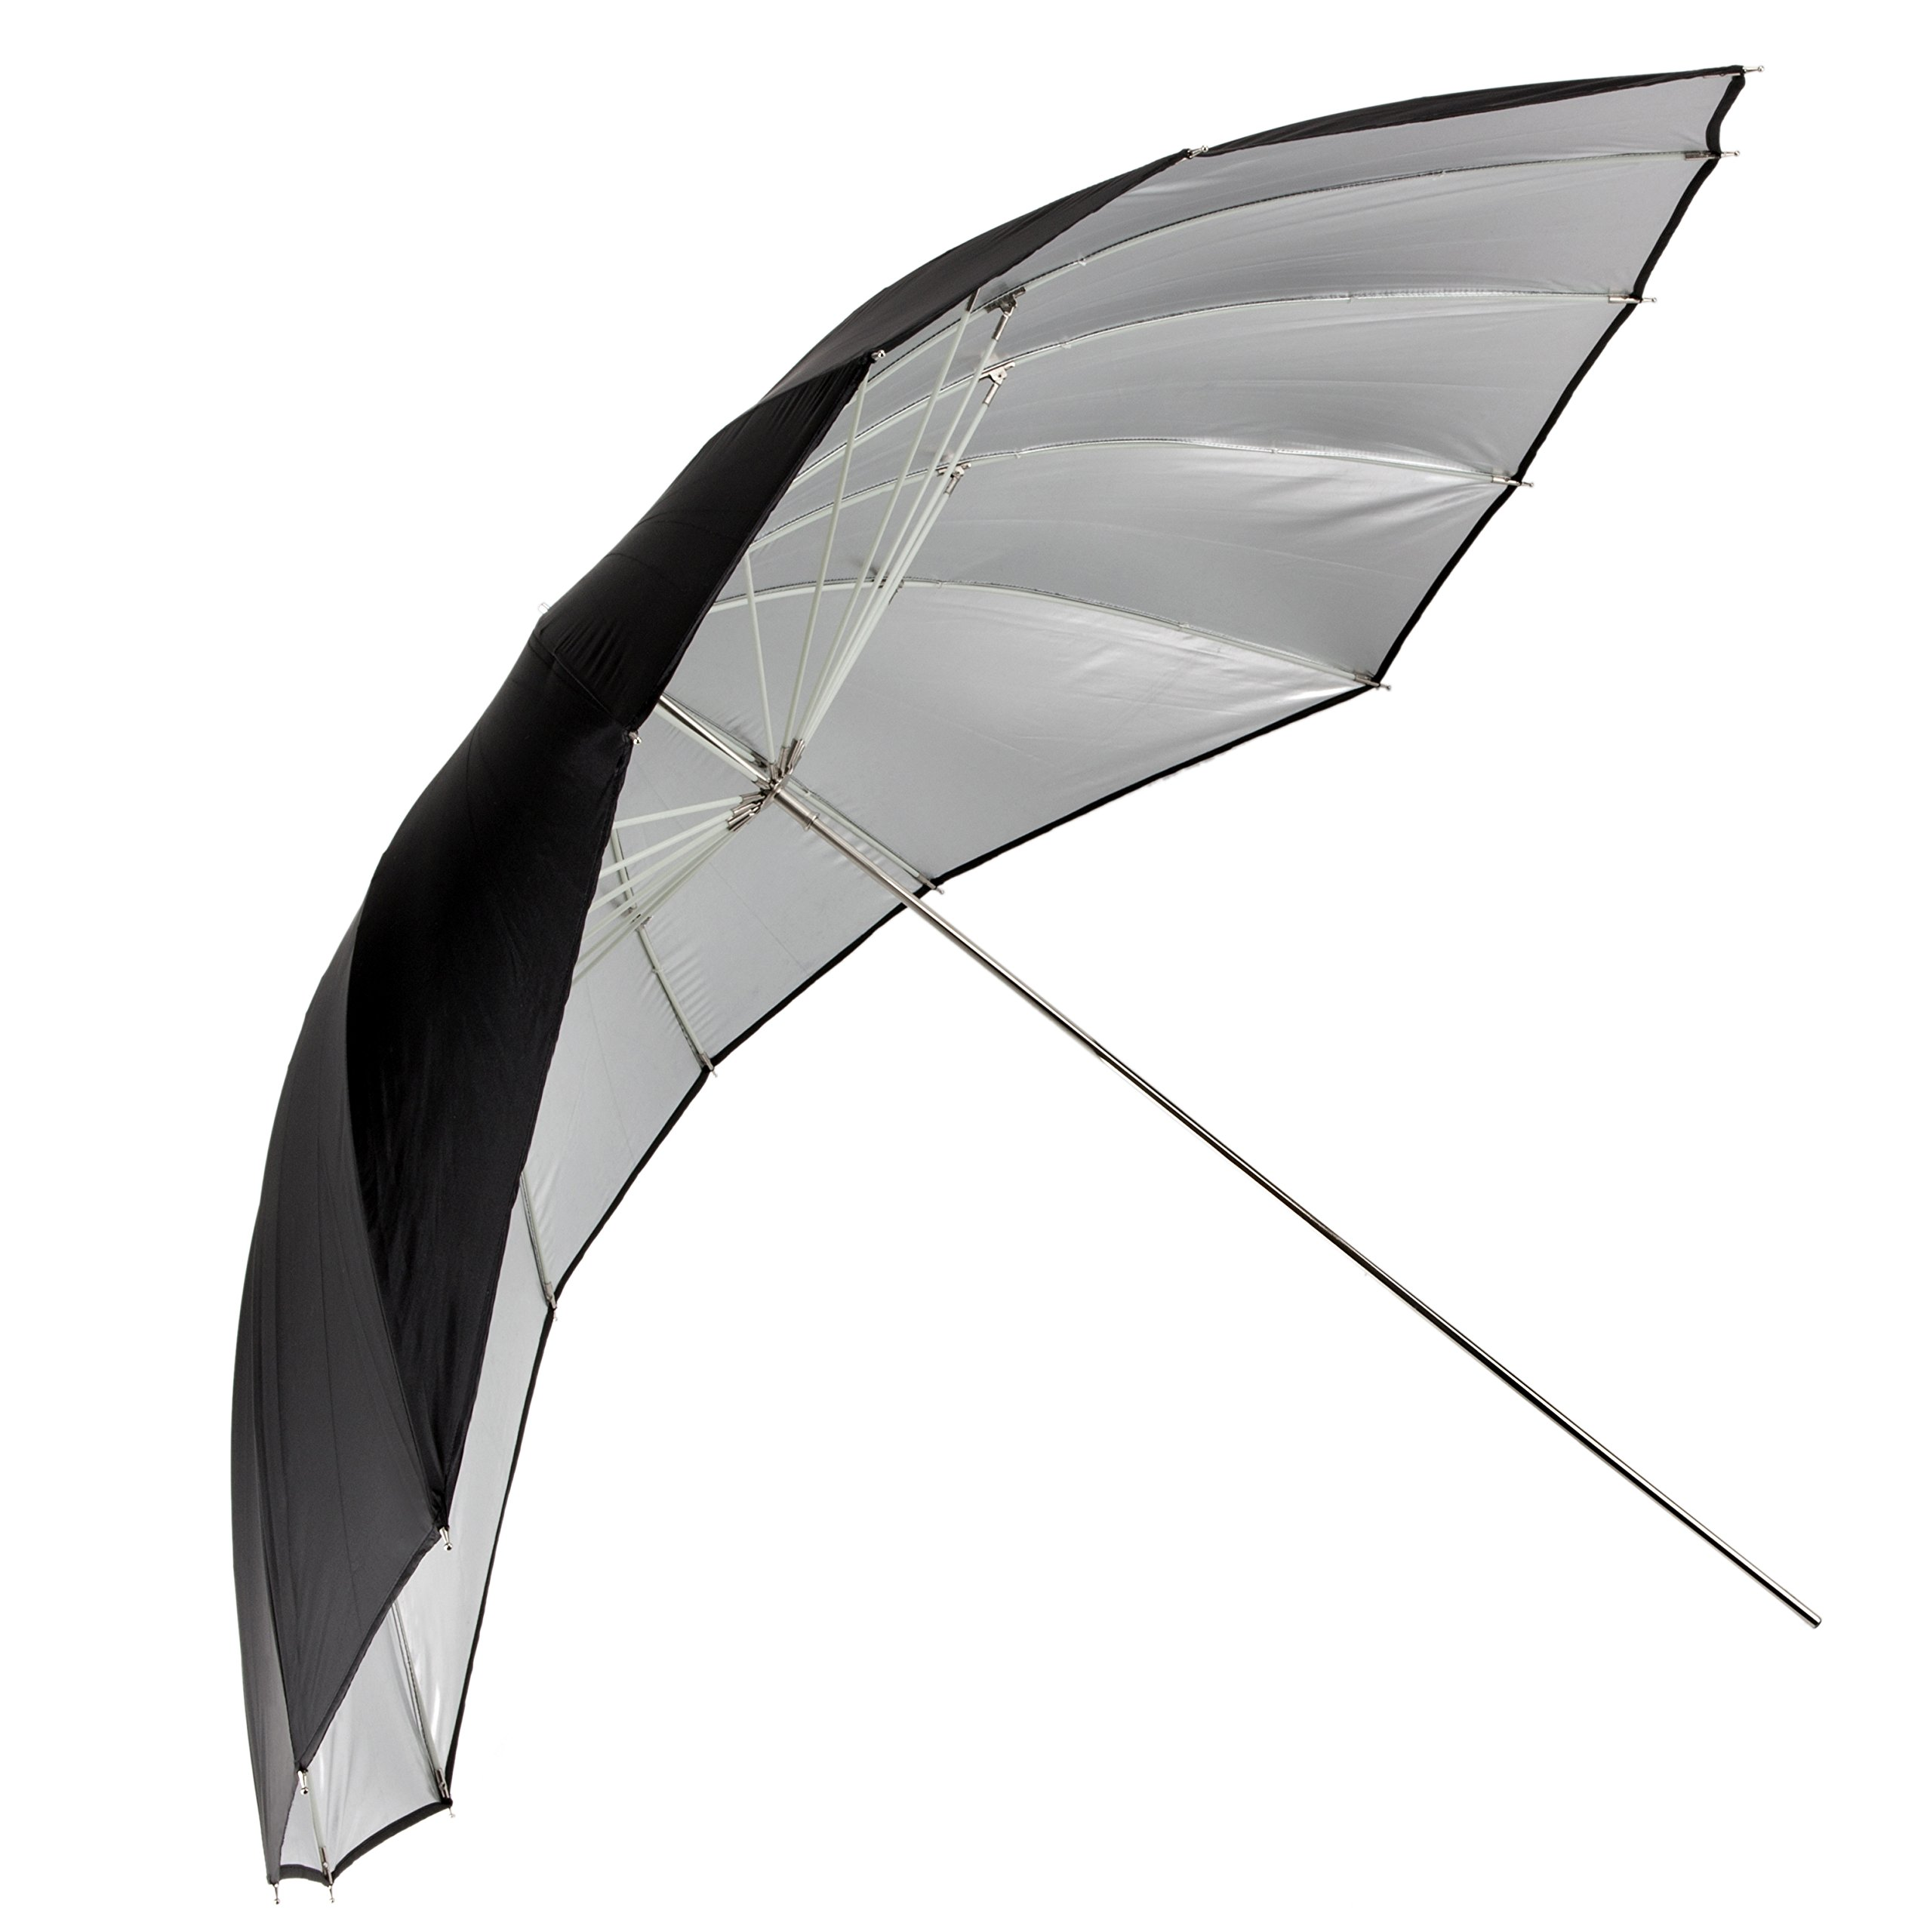 ''Angler ParaSail Parabolic Umbrella (White with Removable Black/Silver, 60'''')''